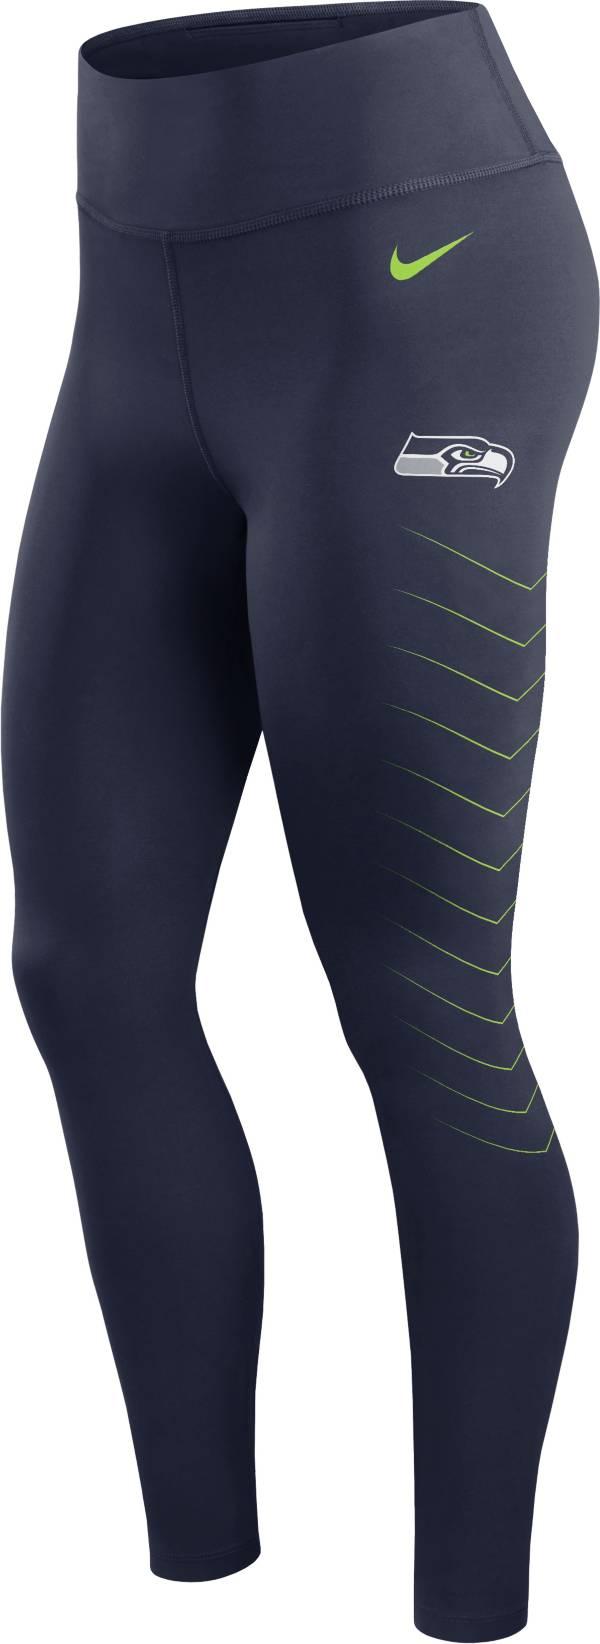 Nike Women's Seattle Seahawks Dri-FIT Navy Performance Leggings product image